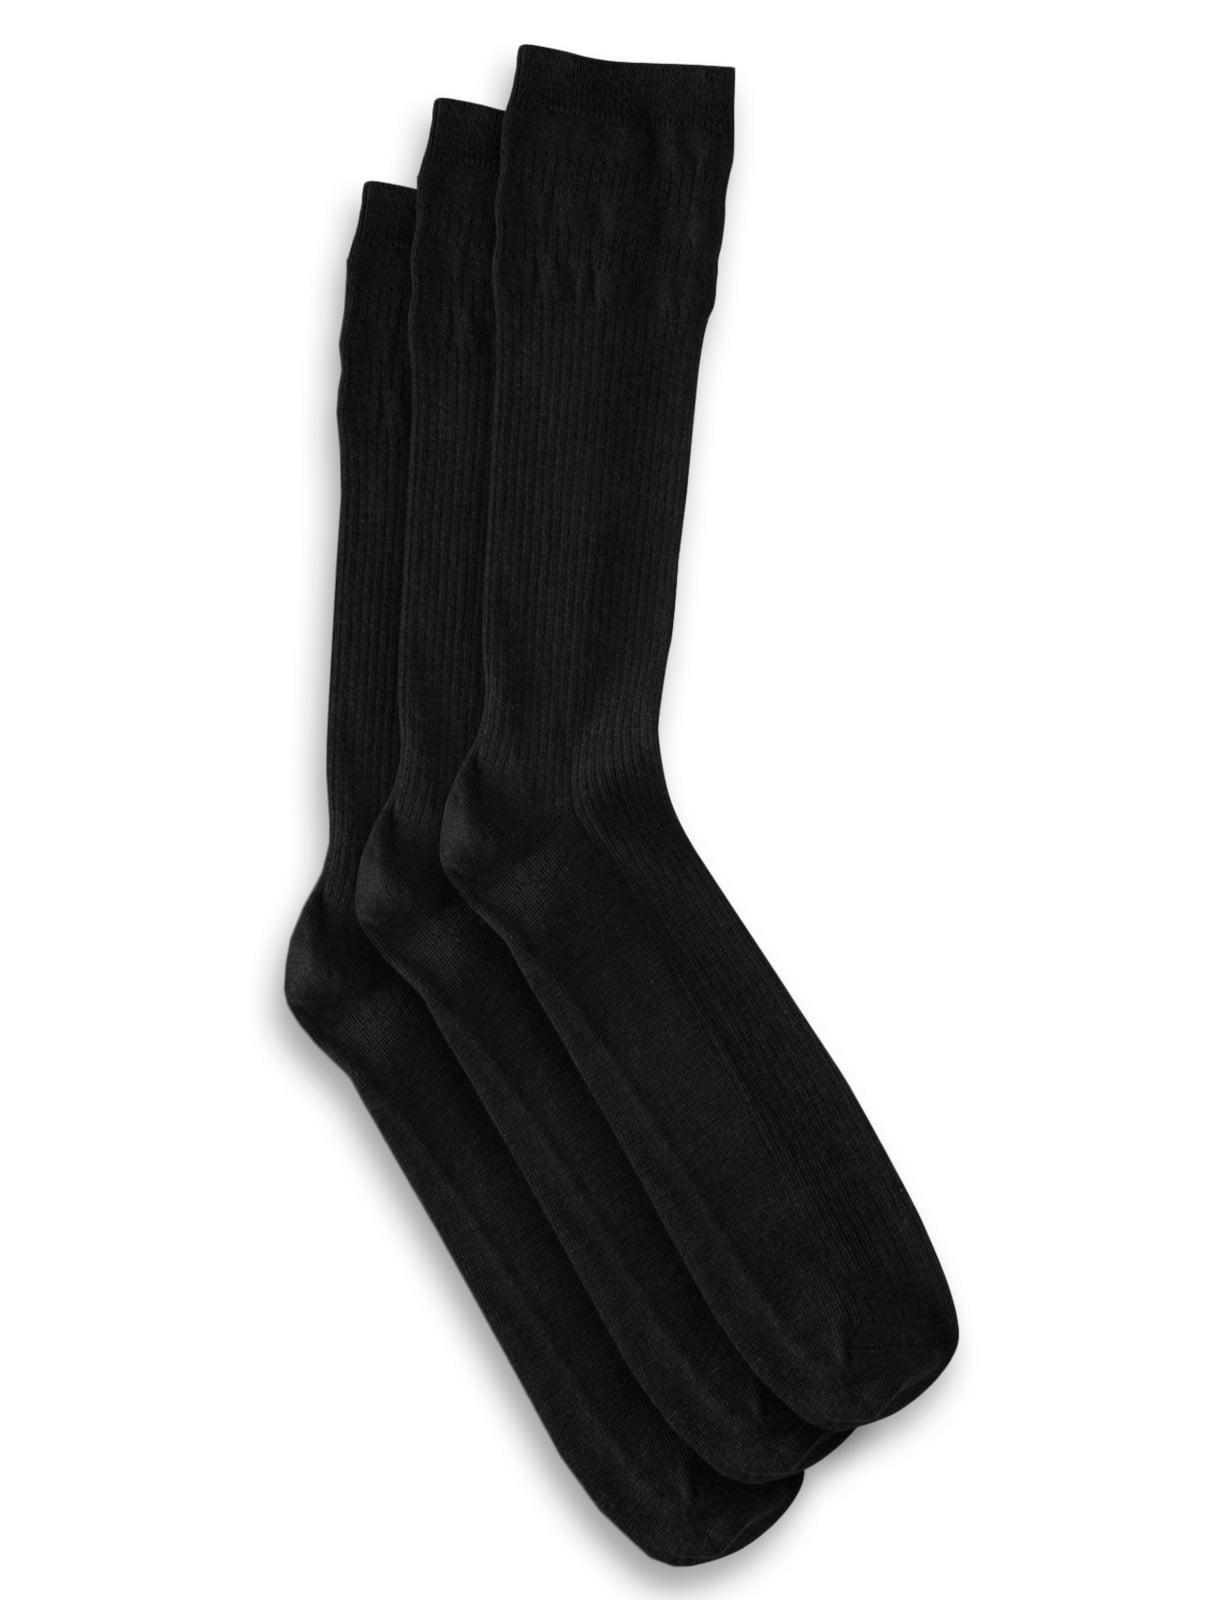 Men's Big & Tall Harbor Bay 3-pk Non-Elastic Crew Socks